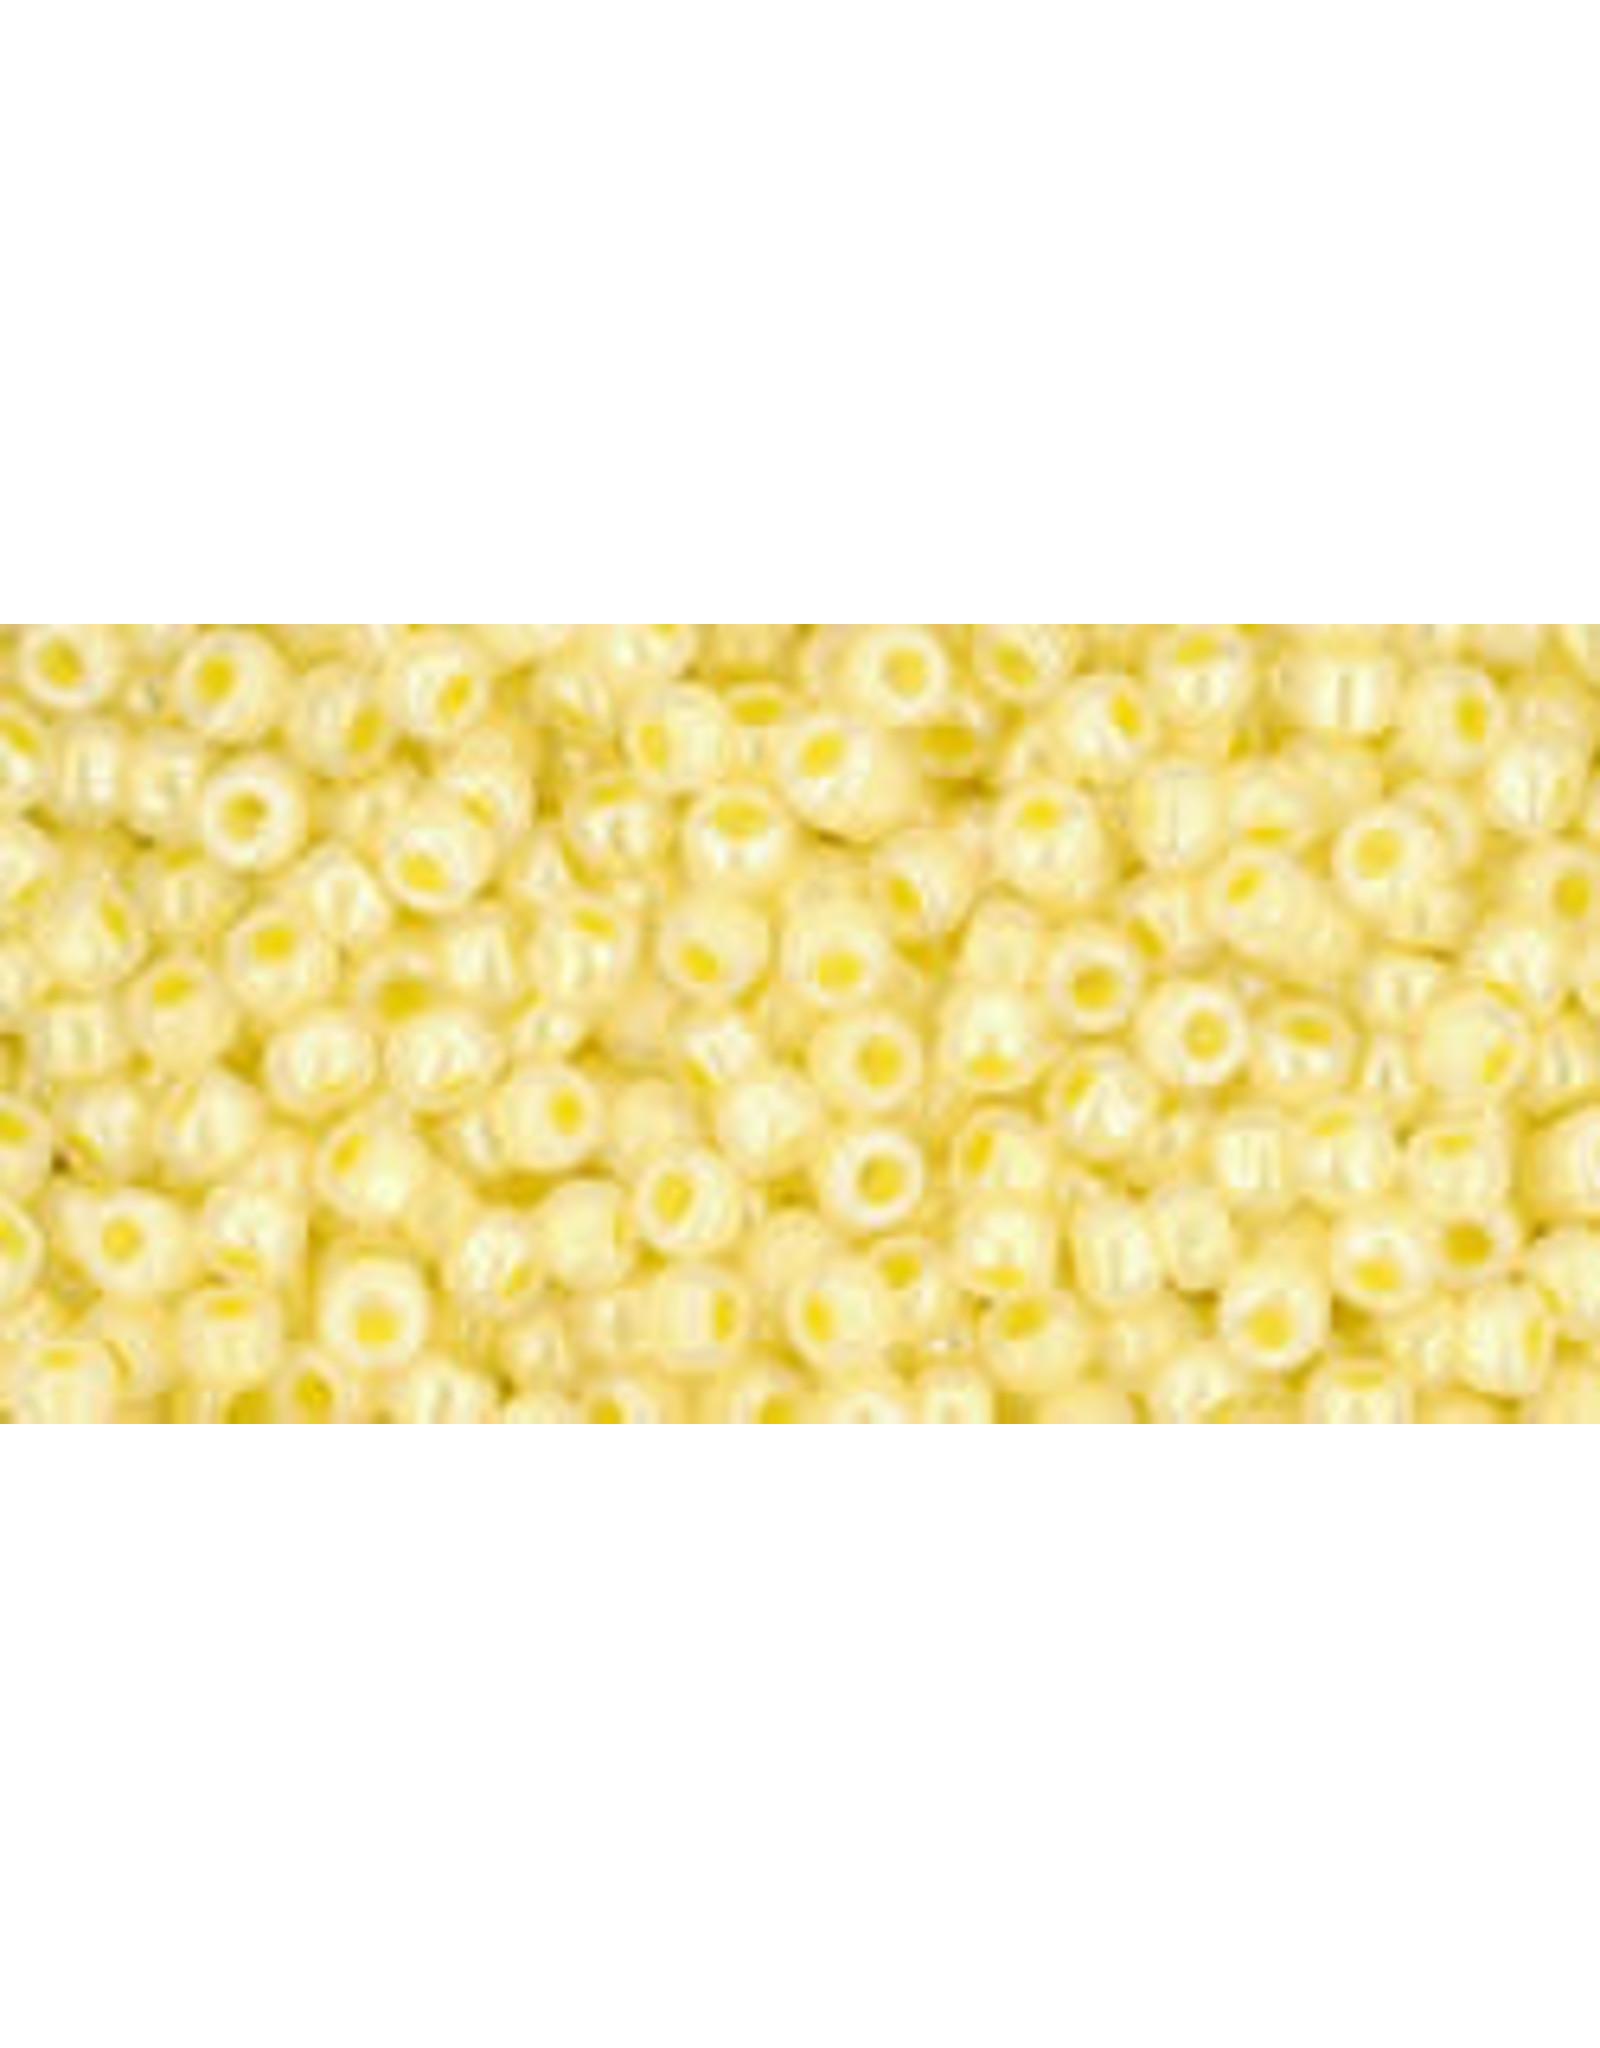 Toho 902 11  Round 6g Ceylon Lemon Chiffon Yellow